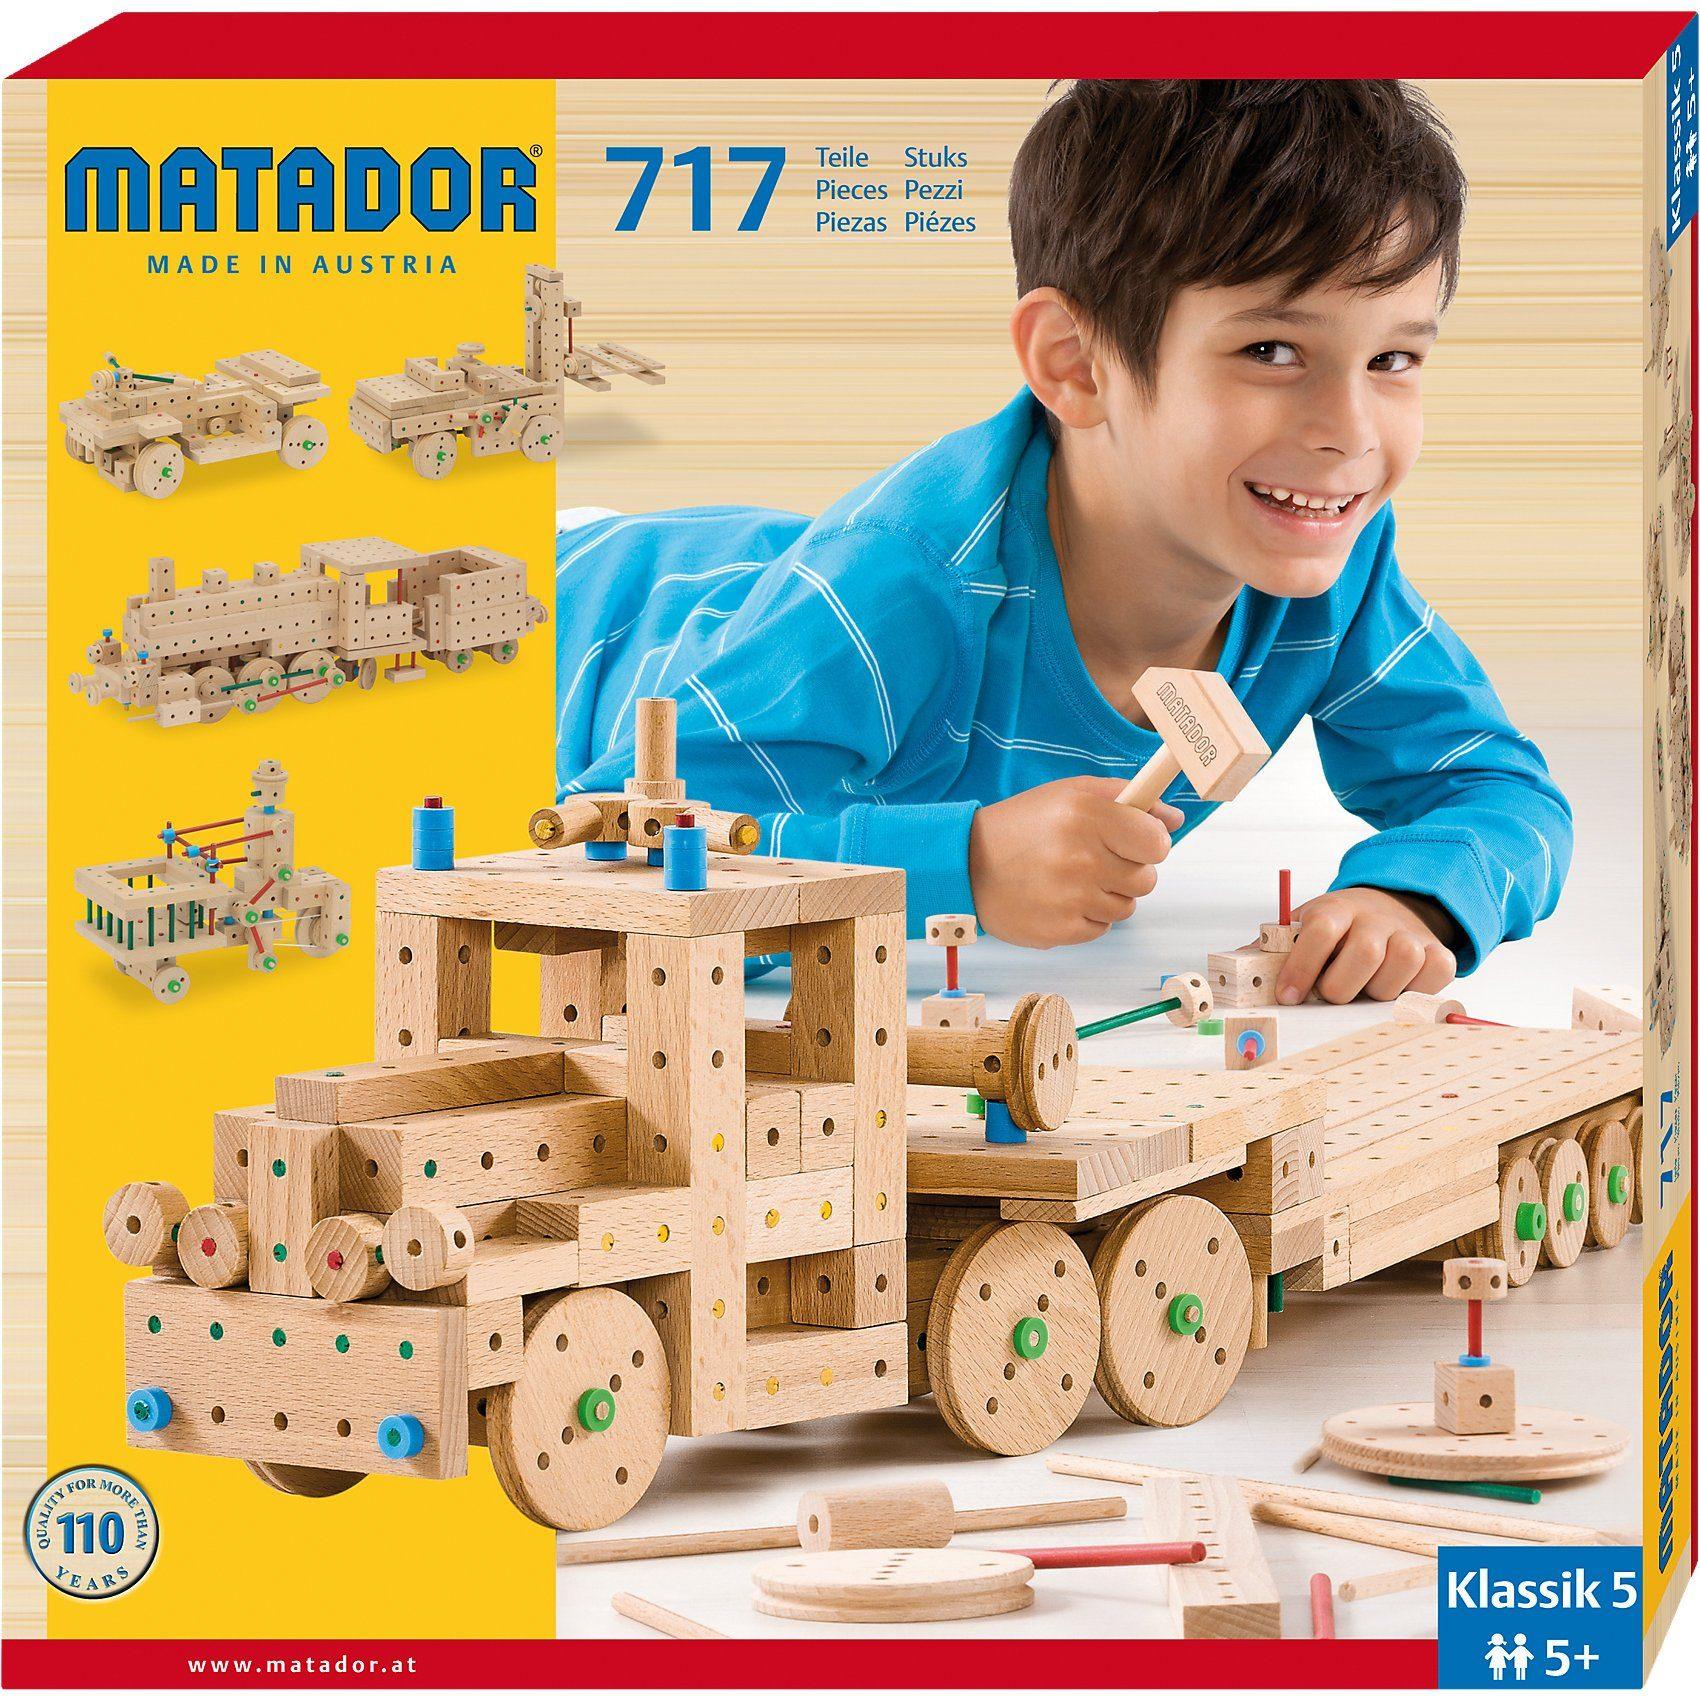 Matador Klassic Nr.5, 717 Teile